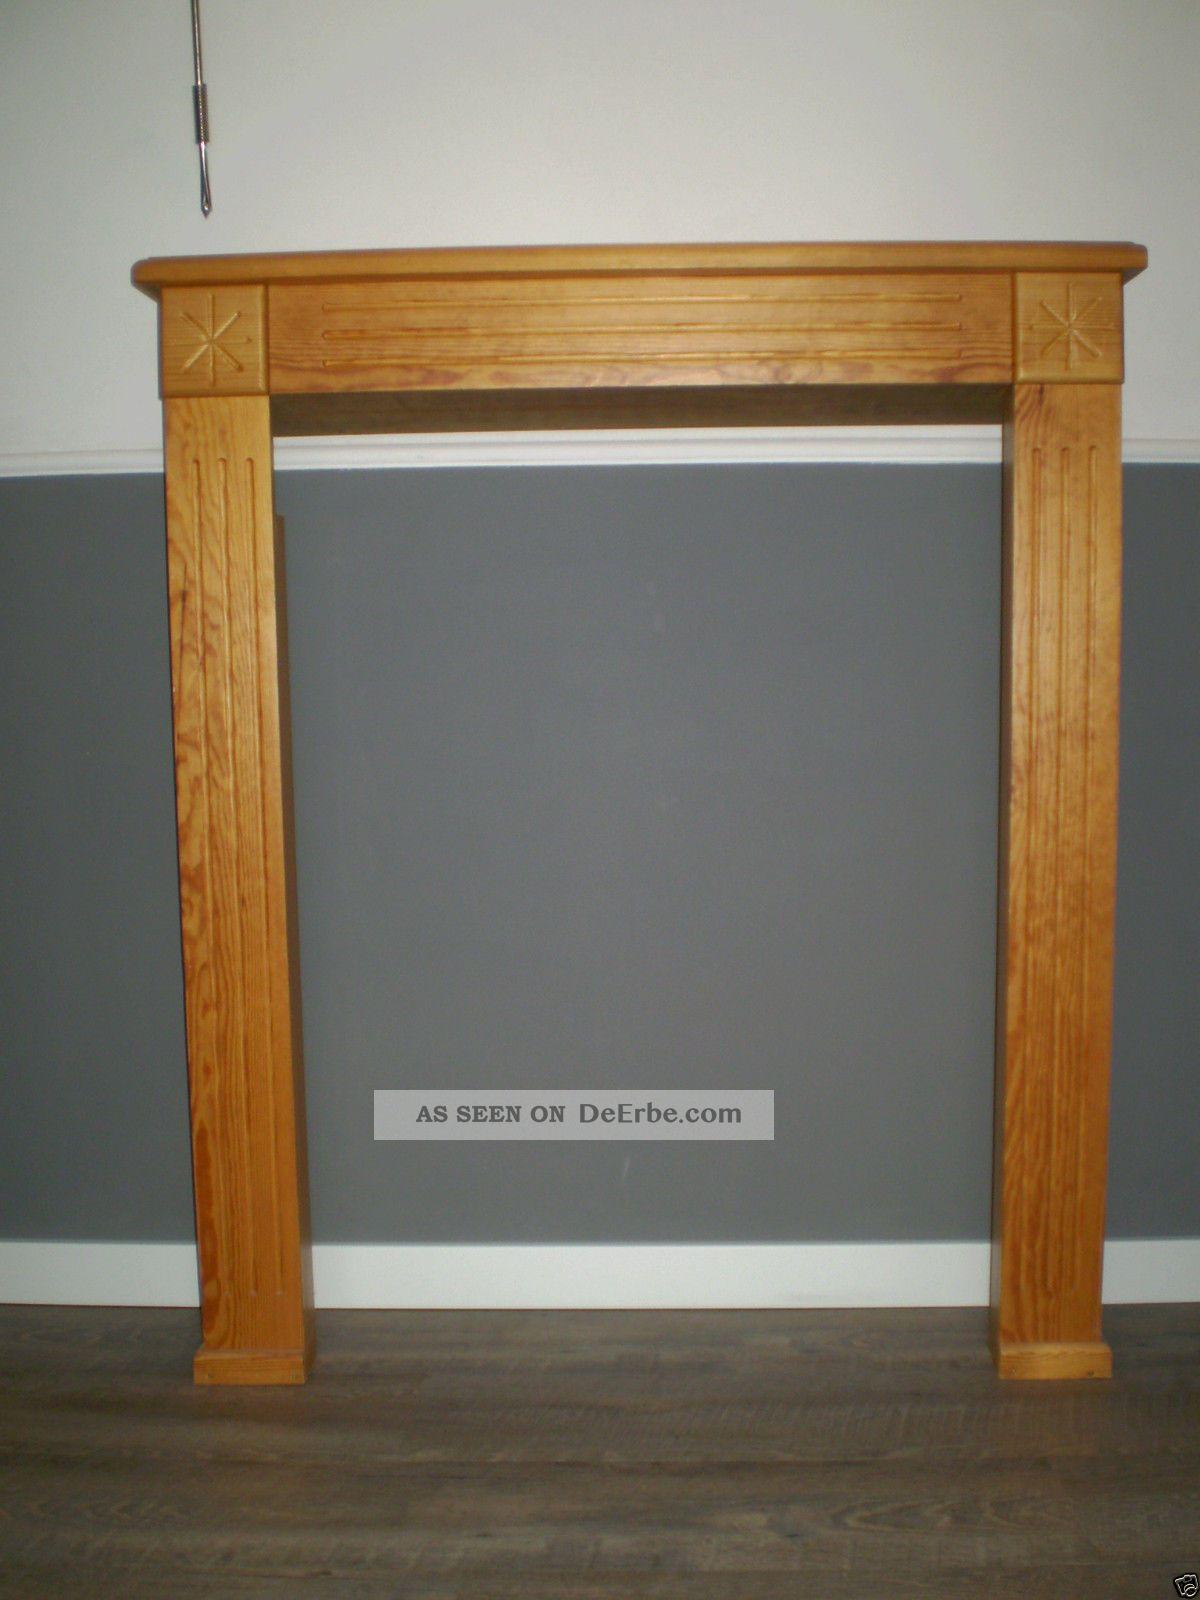 kamineinfassung kaminverkleidung kaminumrandung. Black Bedroom Furniture Sets. Home Design Ideas